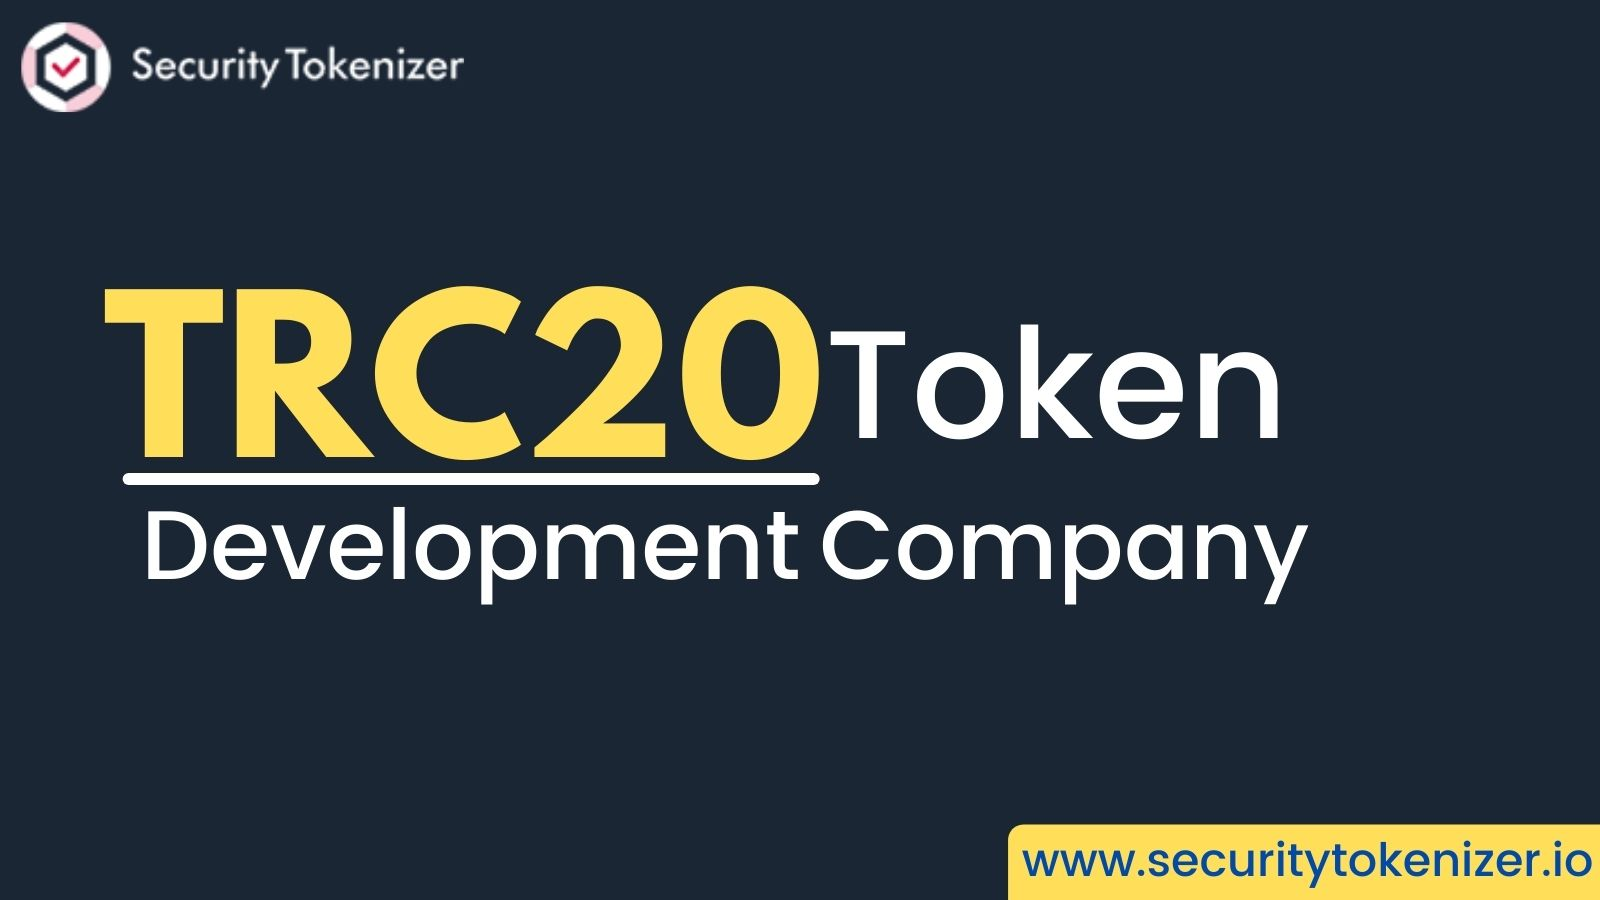 TRC20 Token Development Company - Create Your TRON TRC20 Token